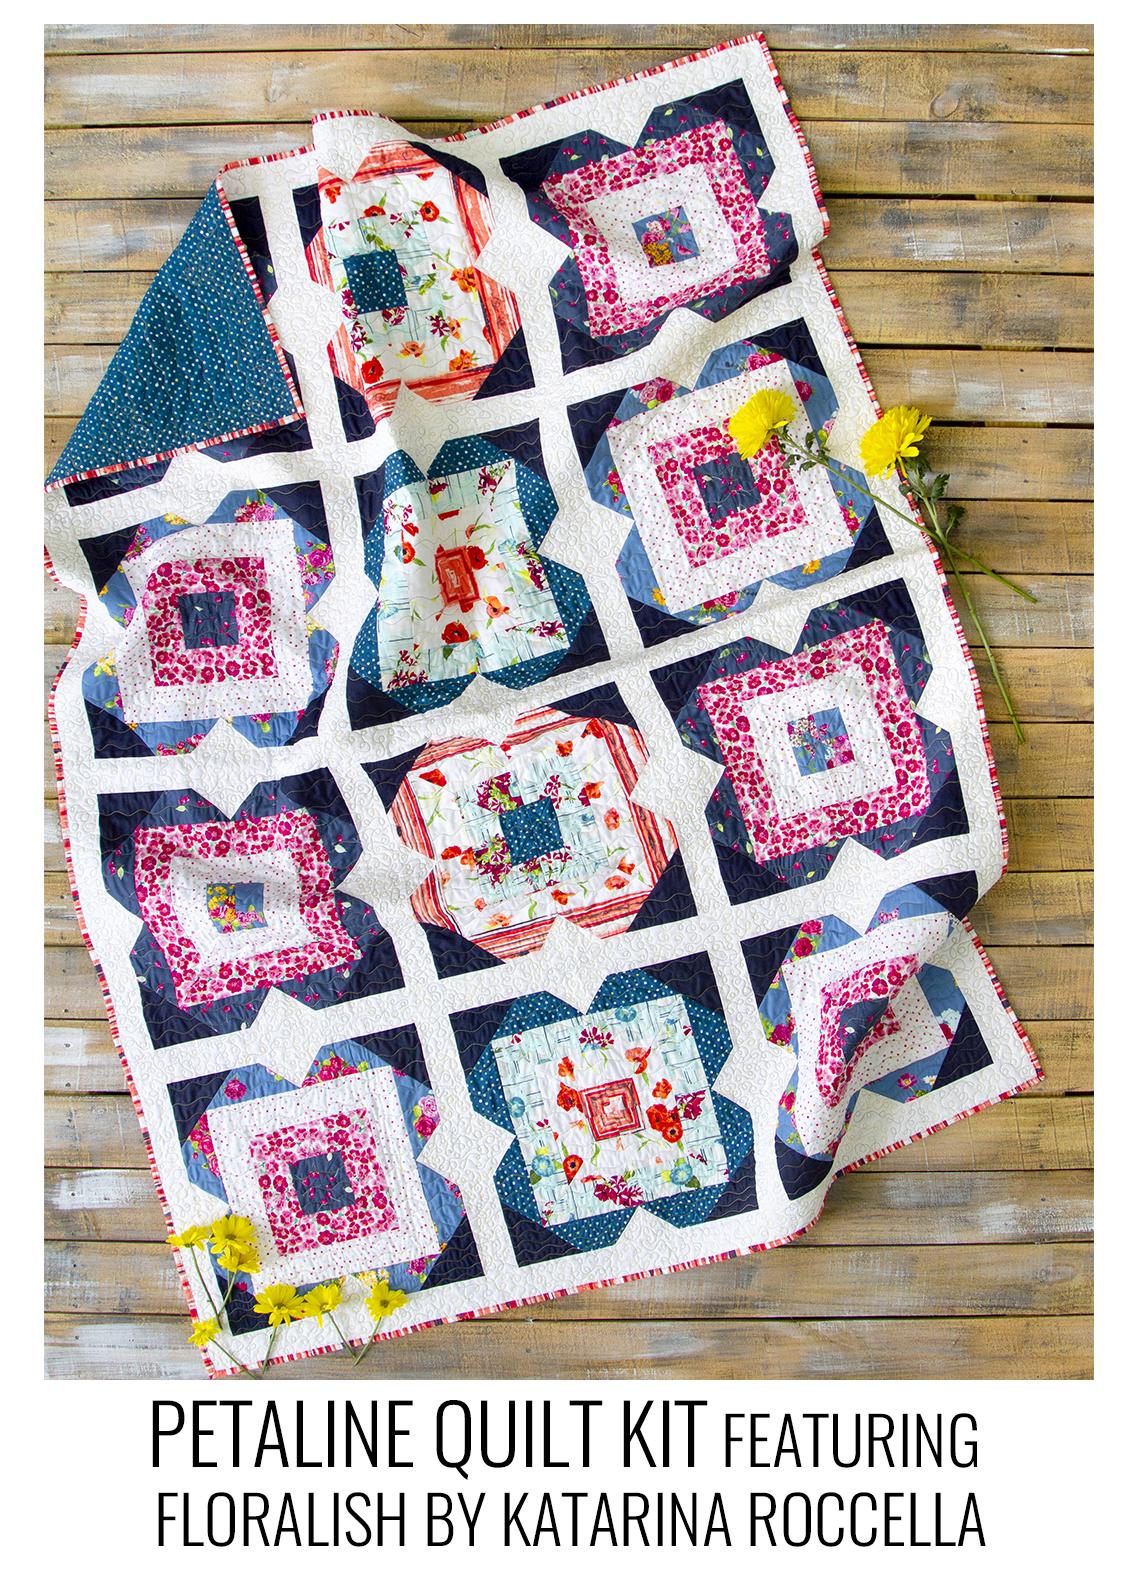 Petaline quilt